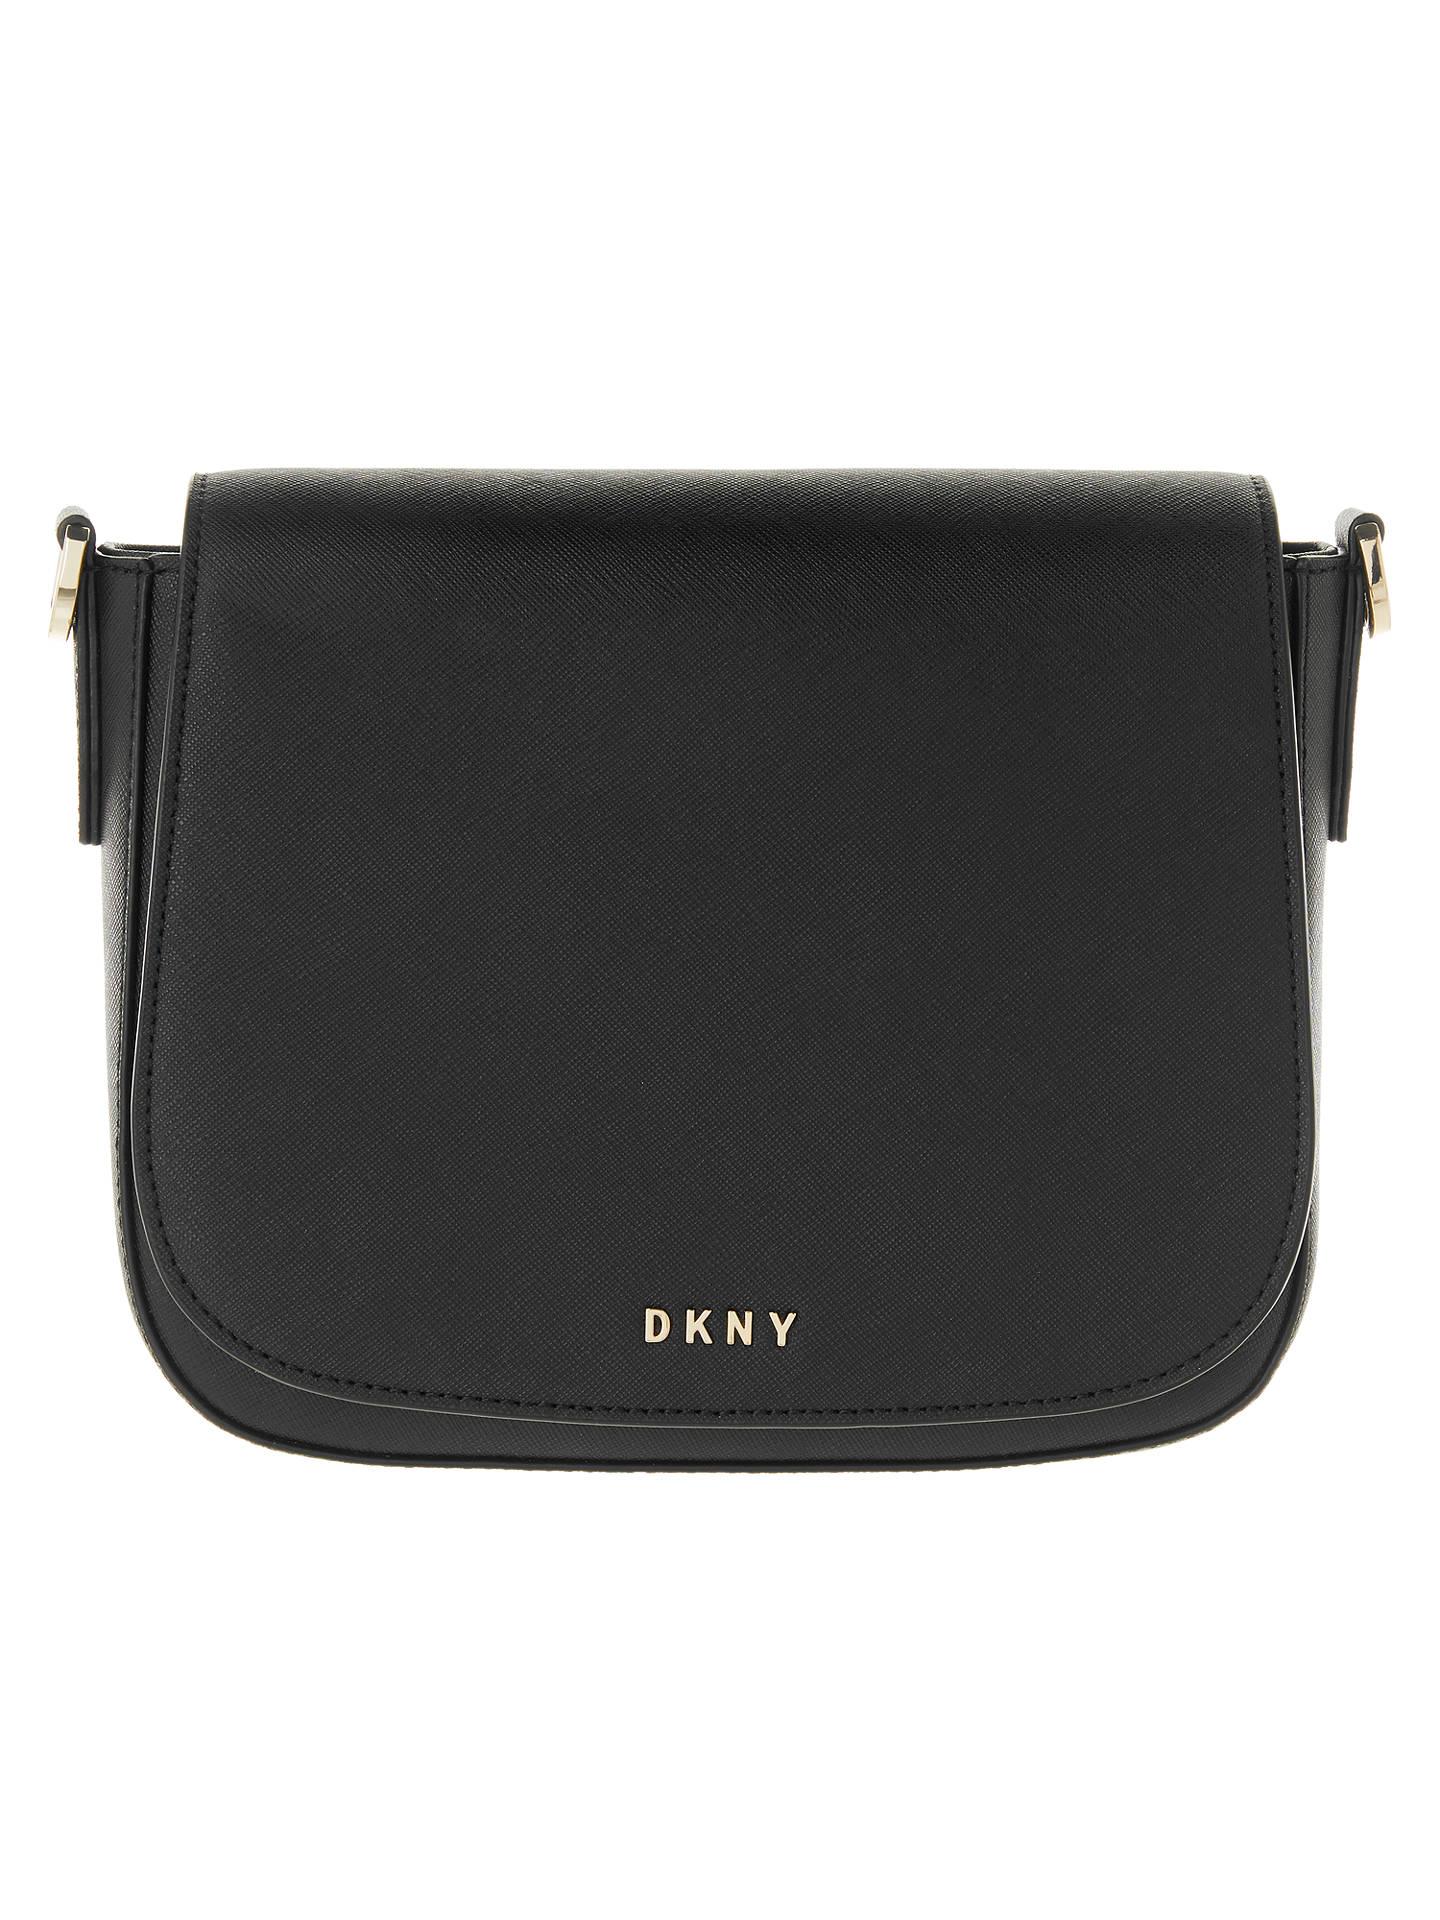 fe7b7506b5 Buy DKNY Bryant Park Saffiano Leather Cross Body Bag